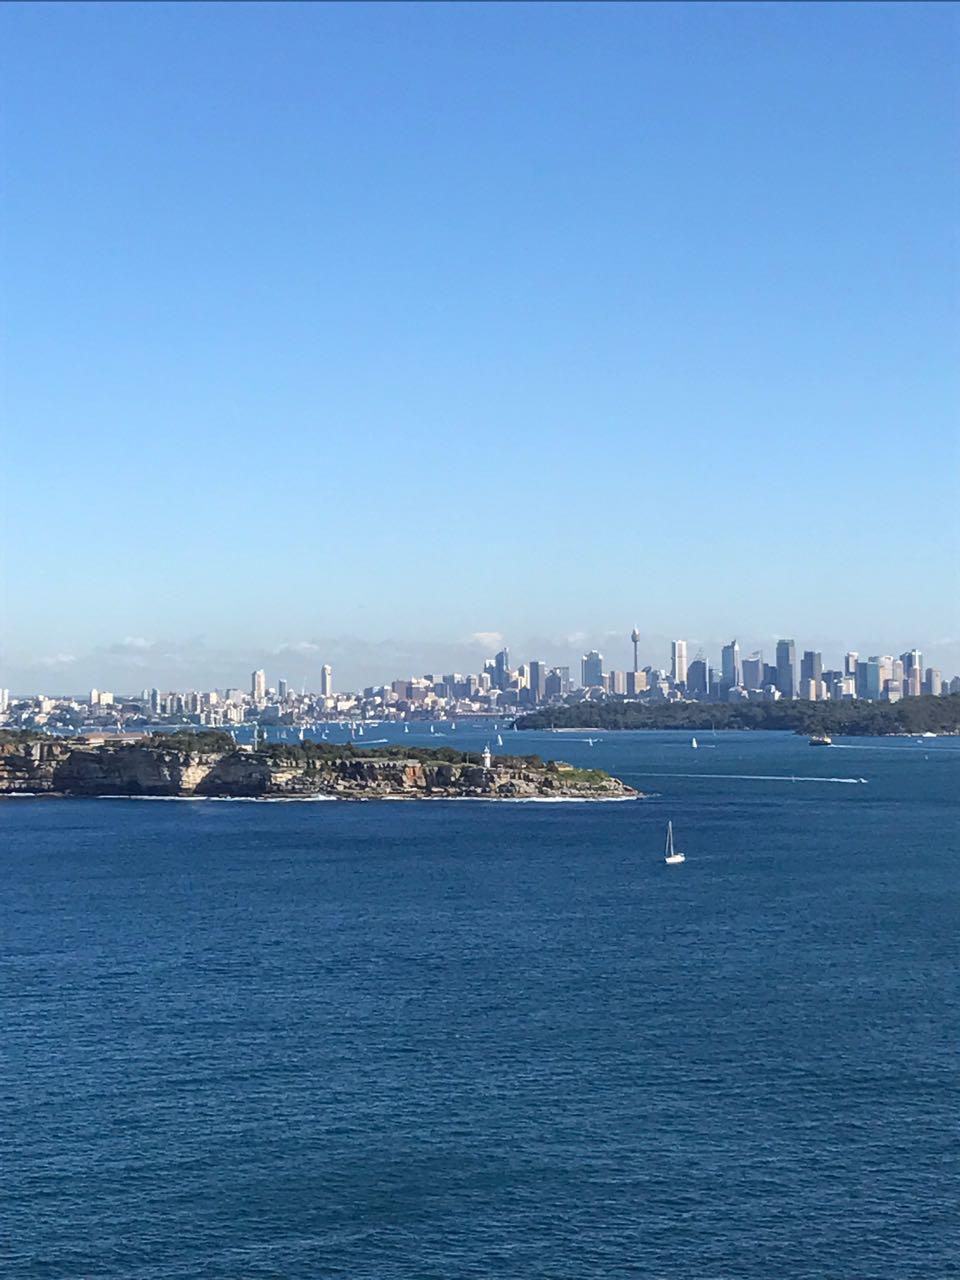 North Head view of Sydney